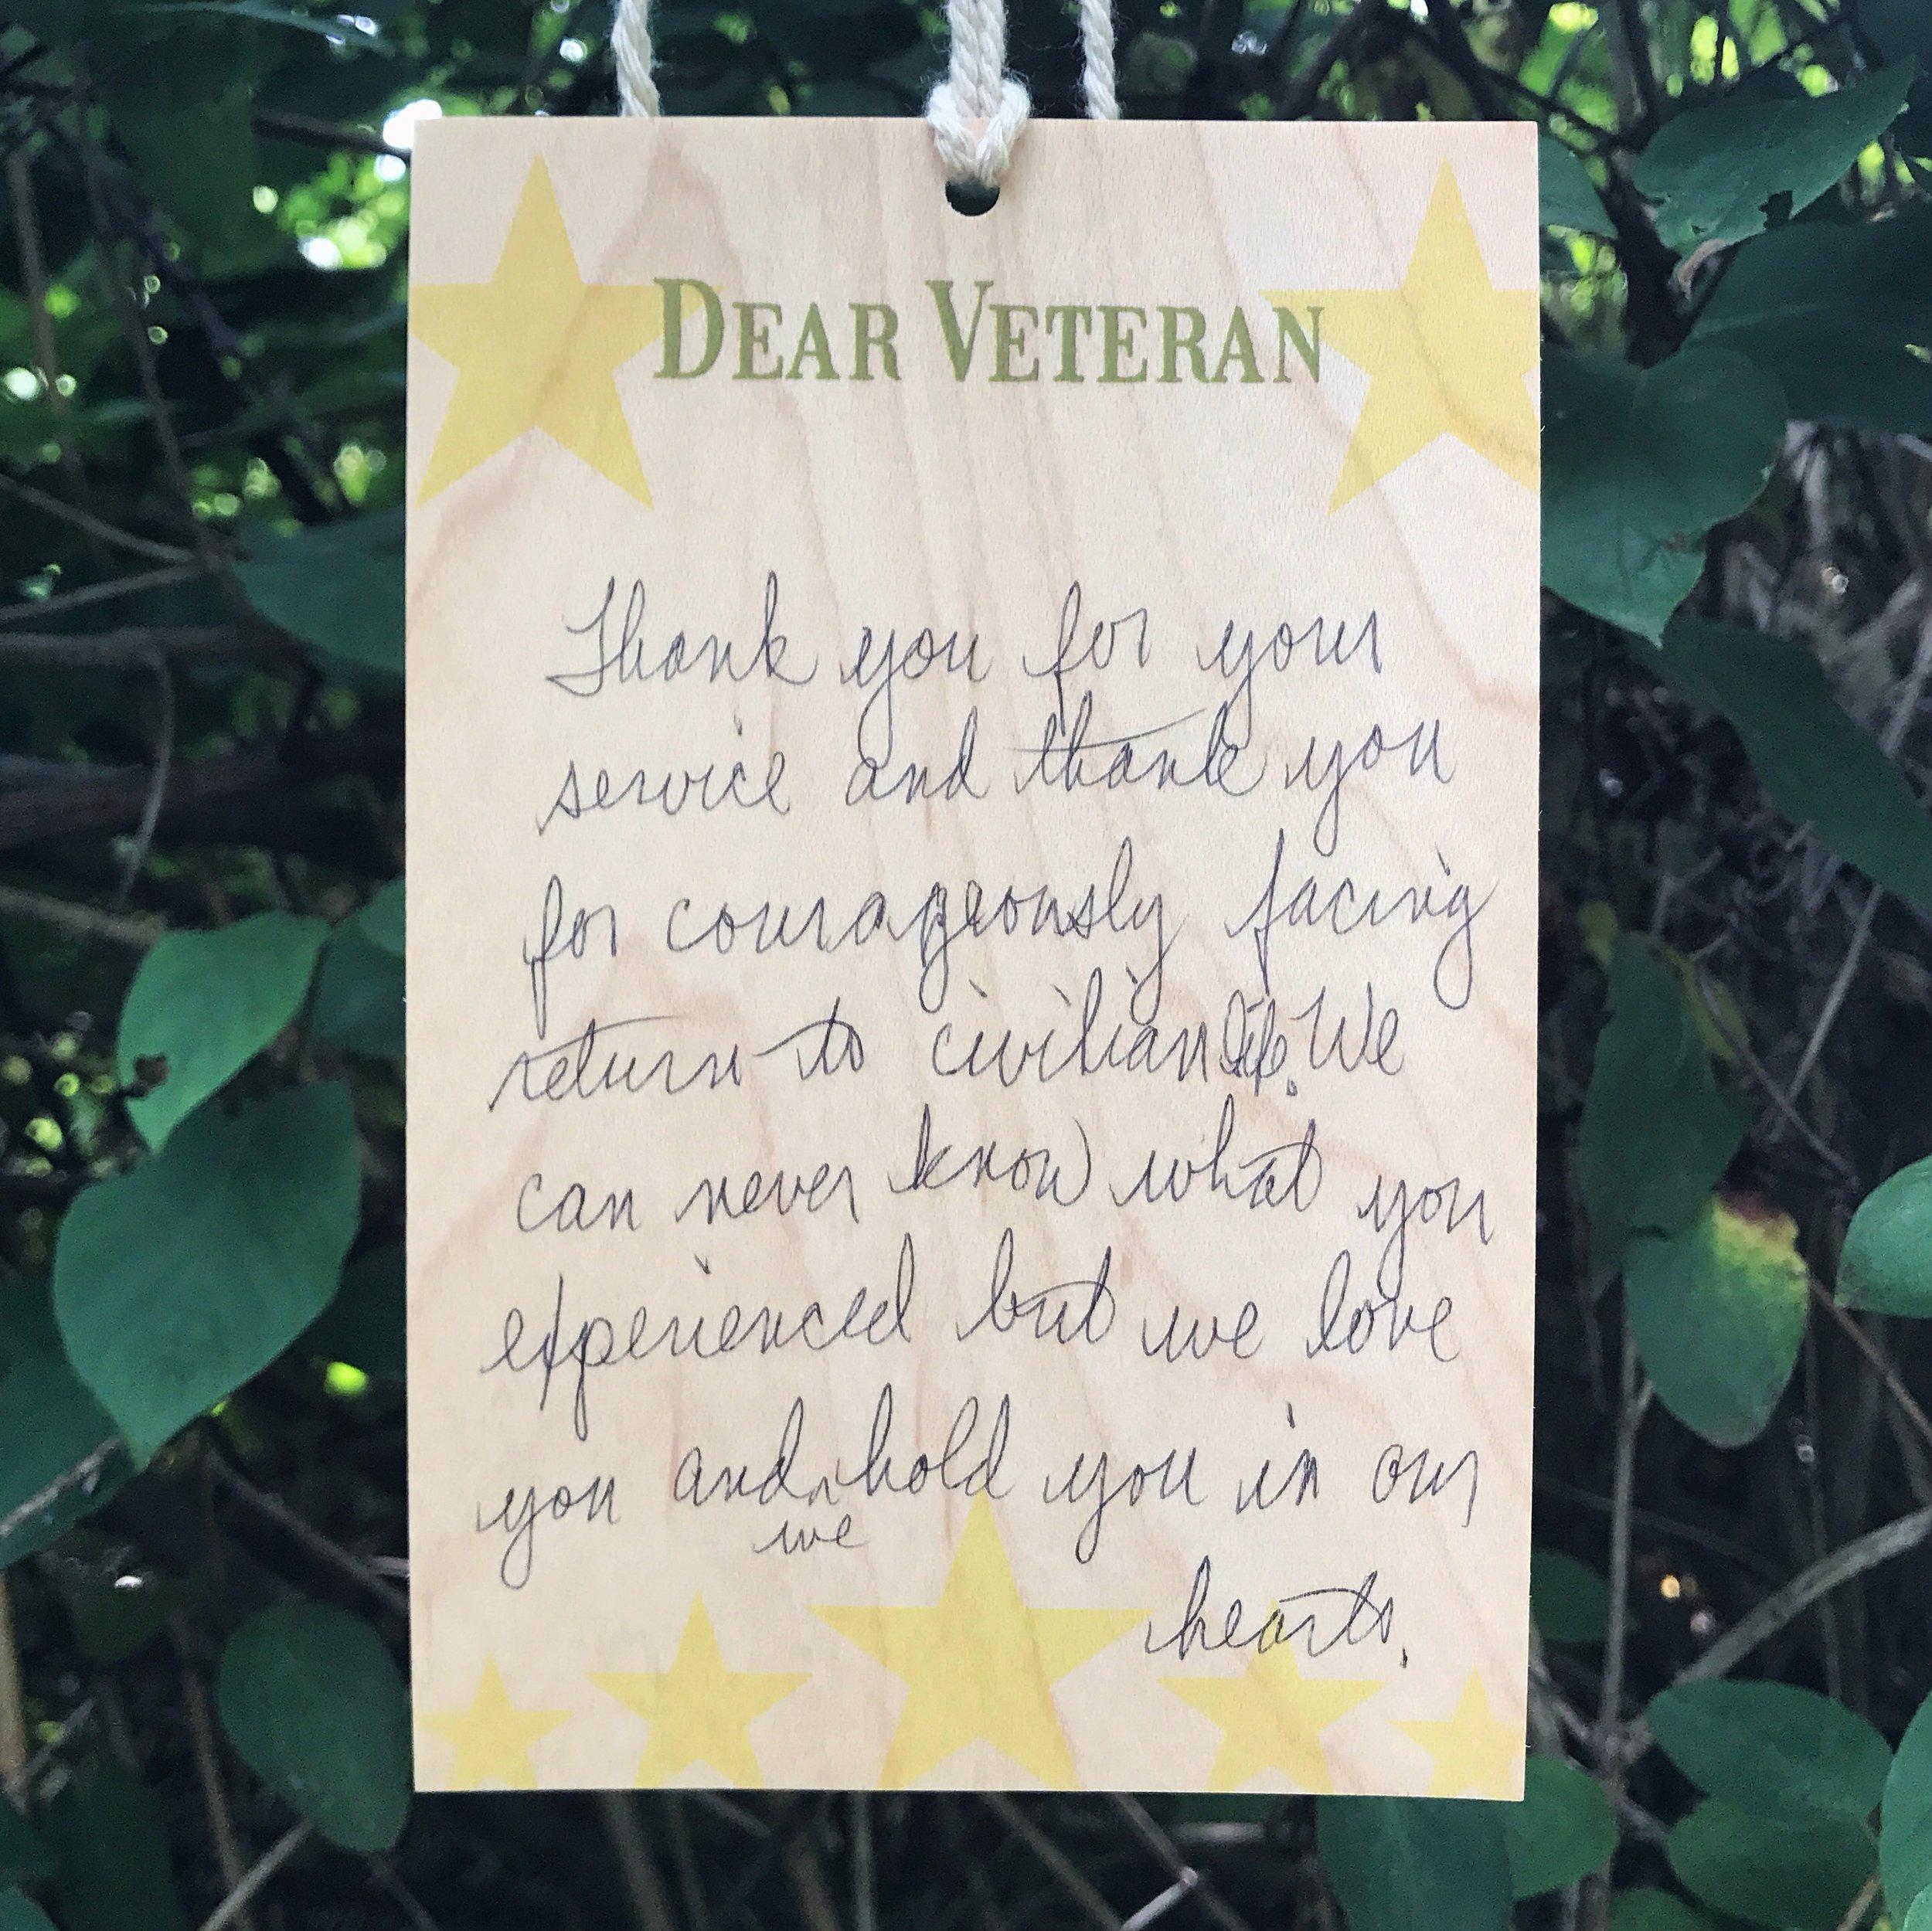 DearVeteran_AUG21_2017.JPG